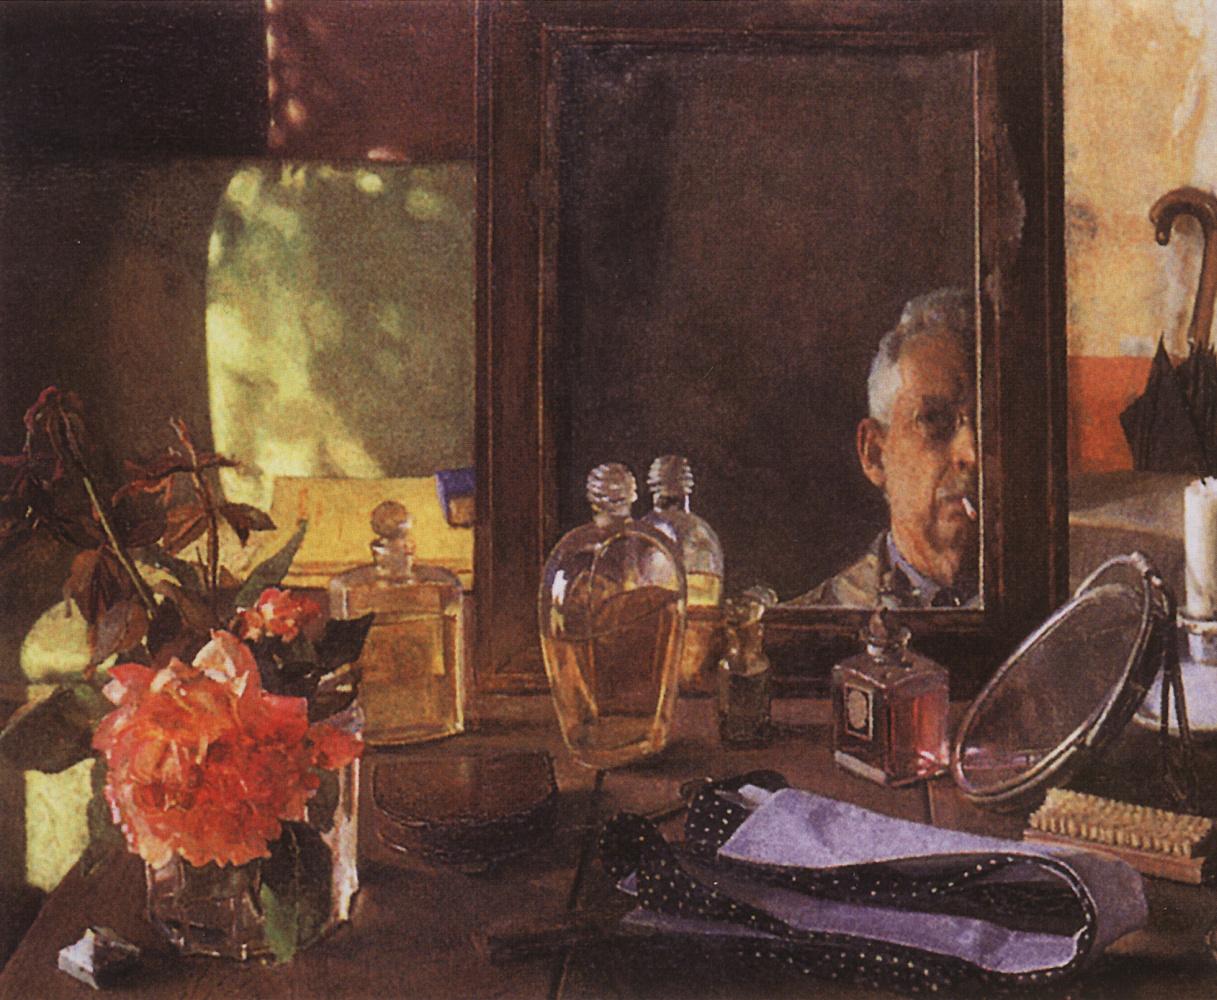 Constantin Somov. Self-portrait in the mirror